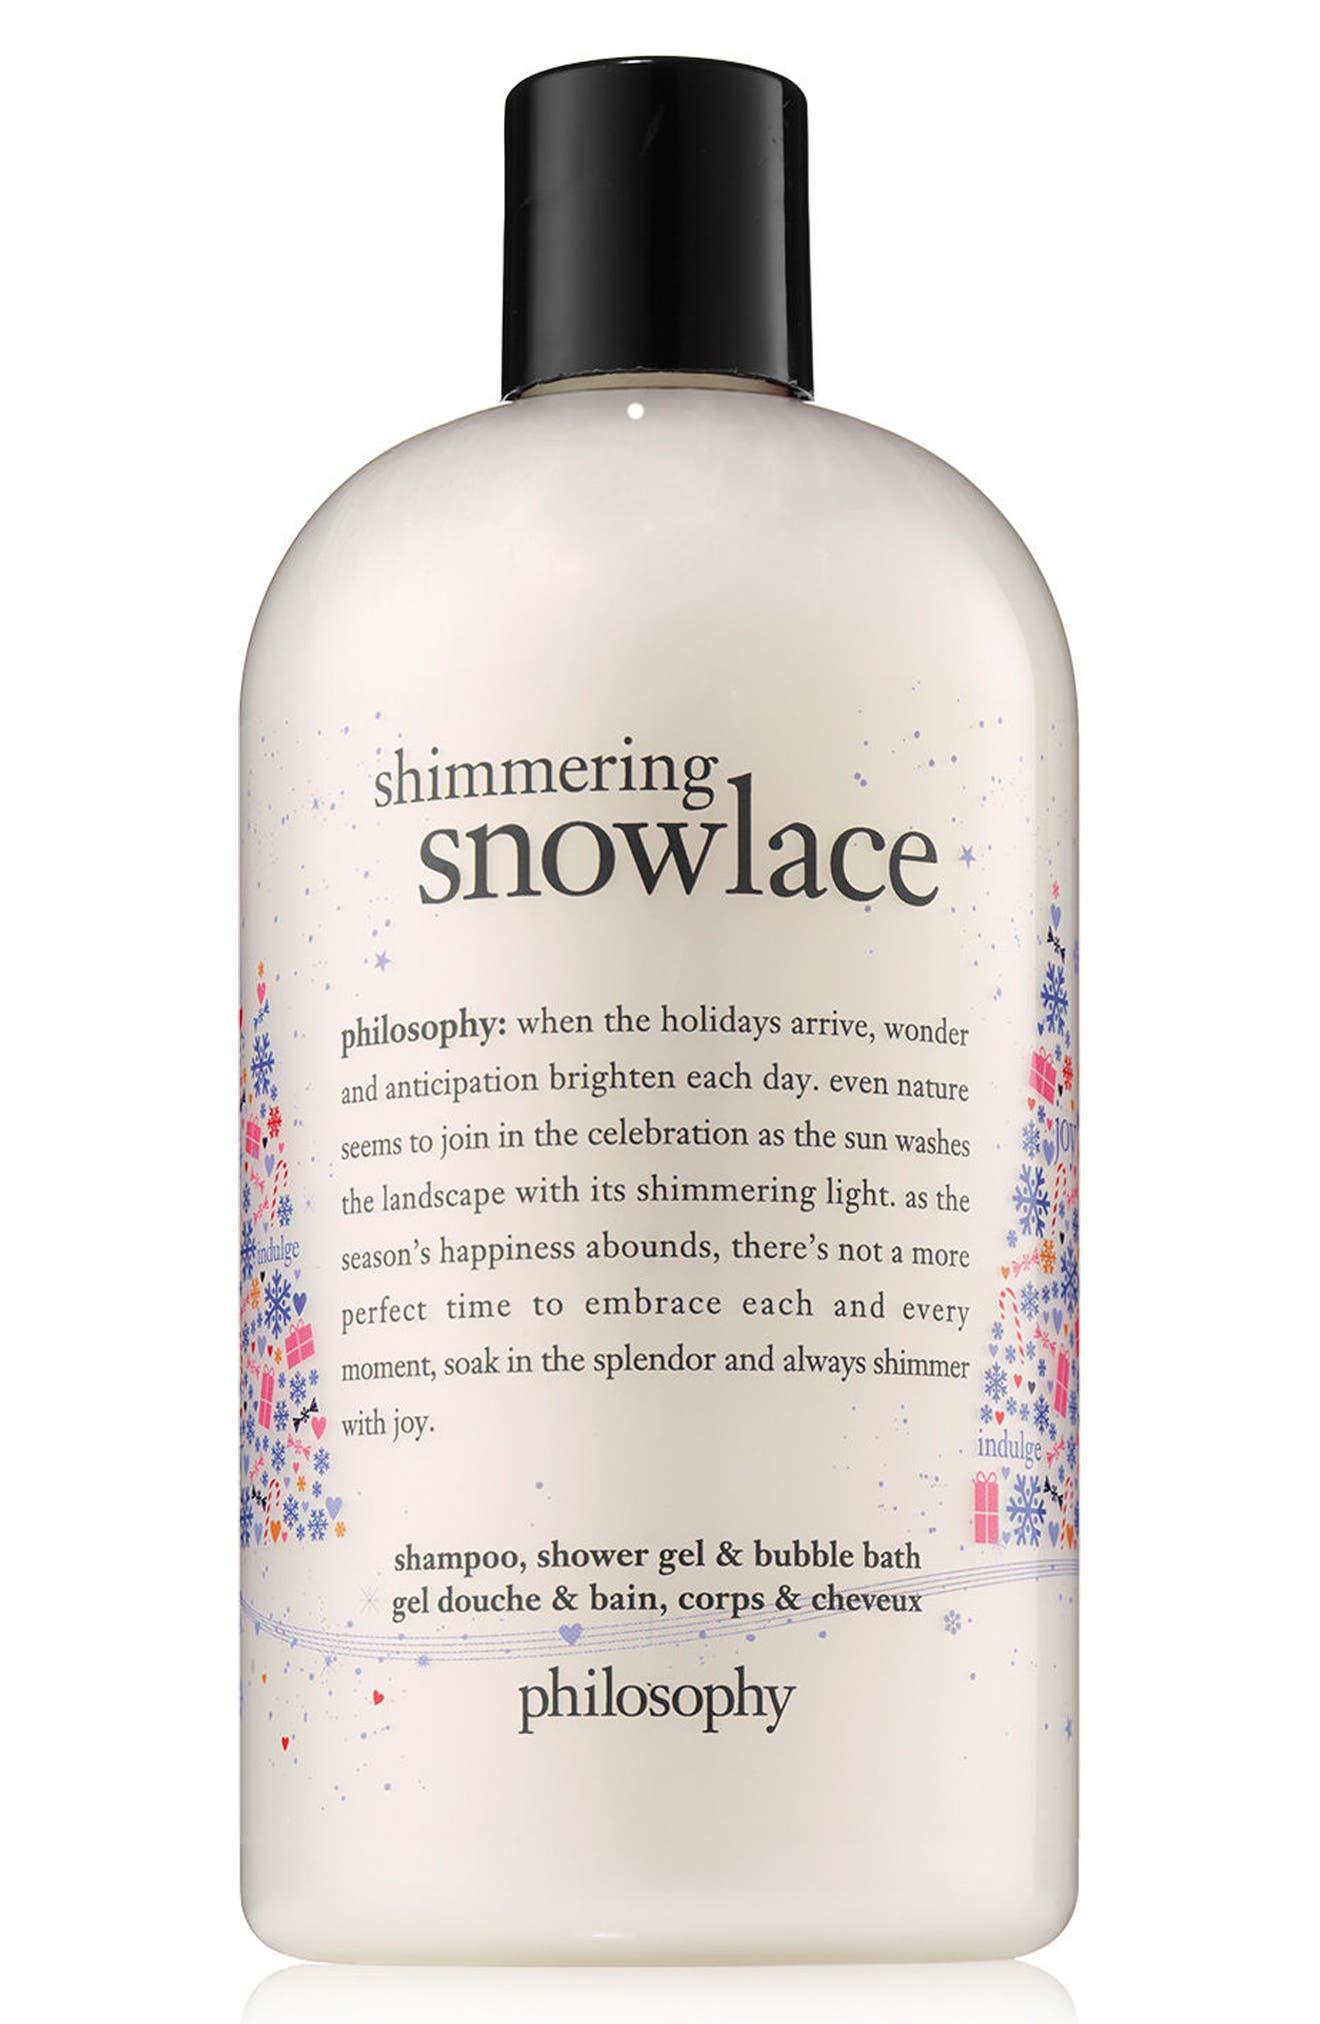 shimmering snowlace shampoo, shower gel & bubble bath,                             Main thumbnail 1, color,